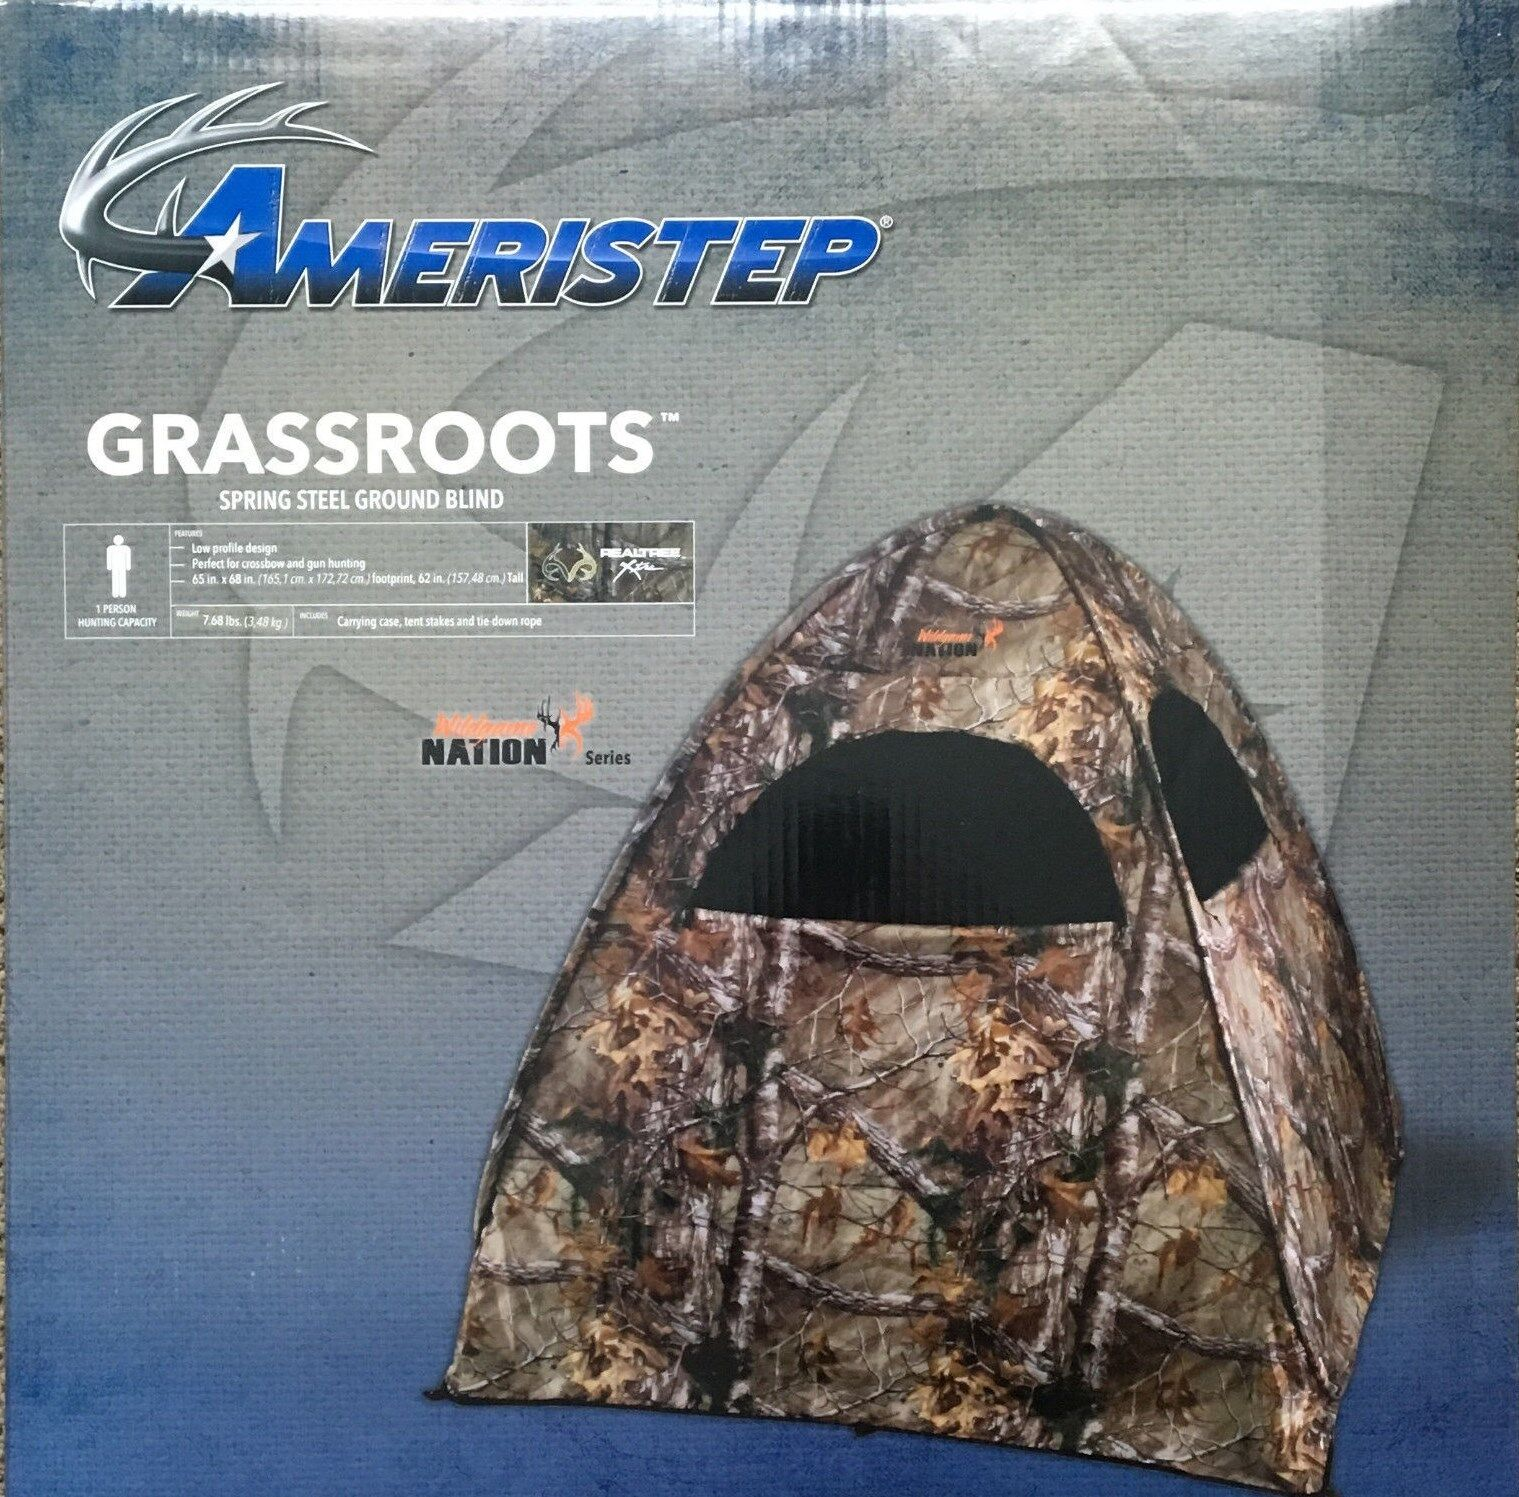 AMERISTEP GRASSROOTS DEER HUNTING BLIND WildgameNation Camo Realtree Xtra Turkey